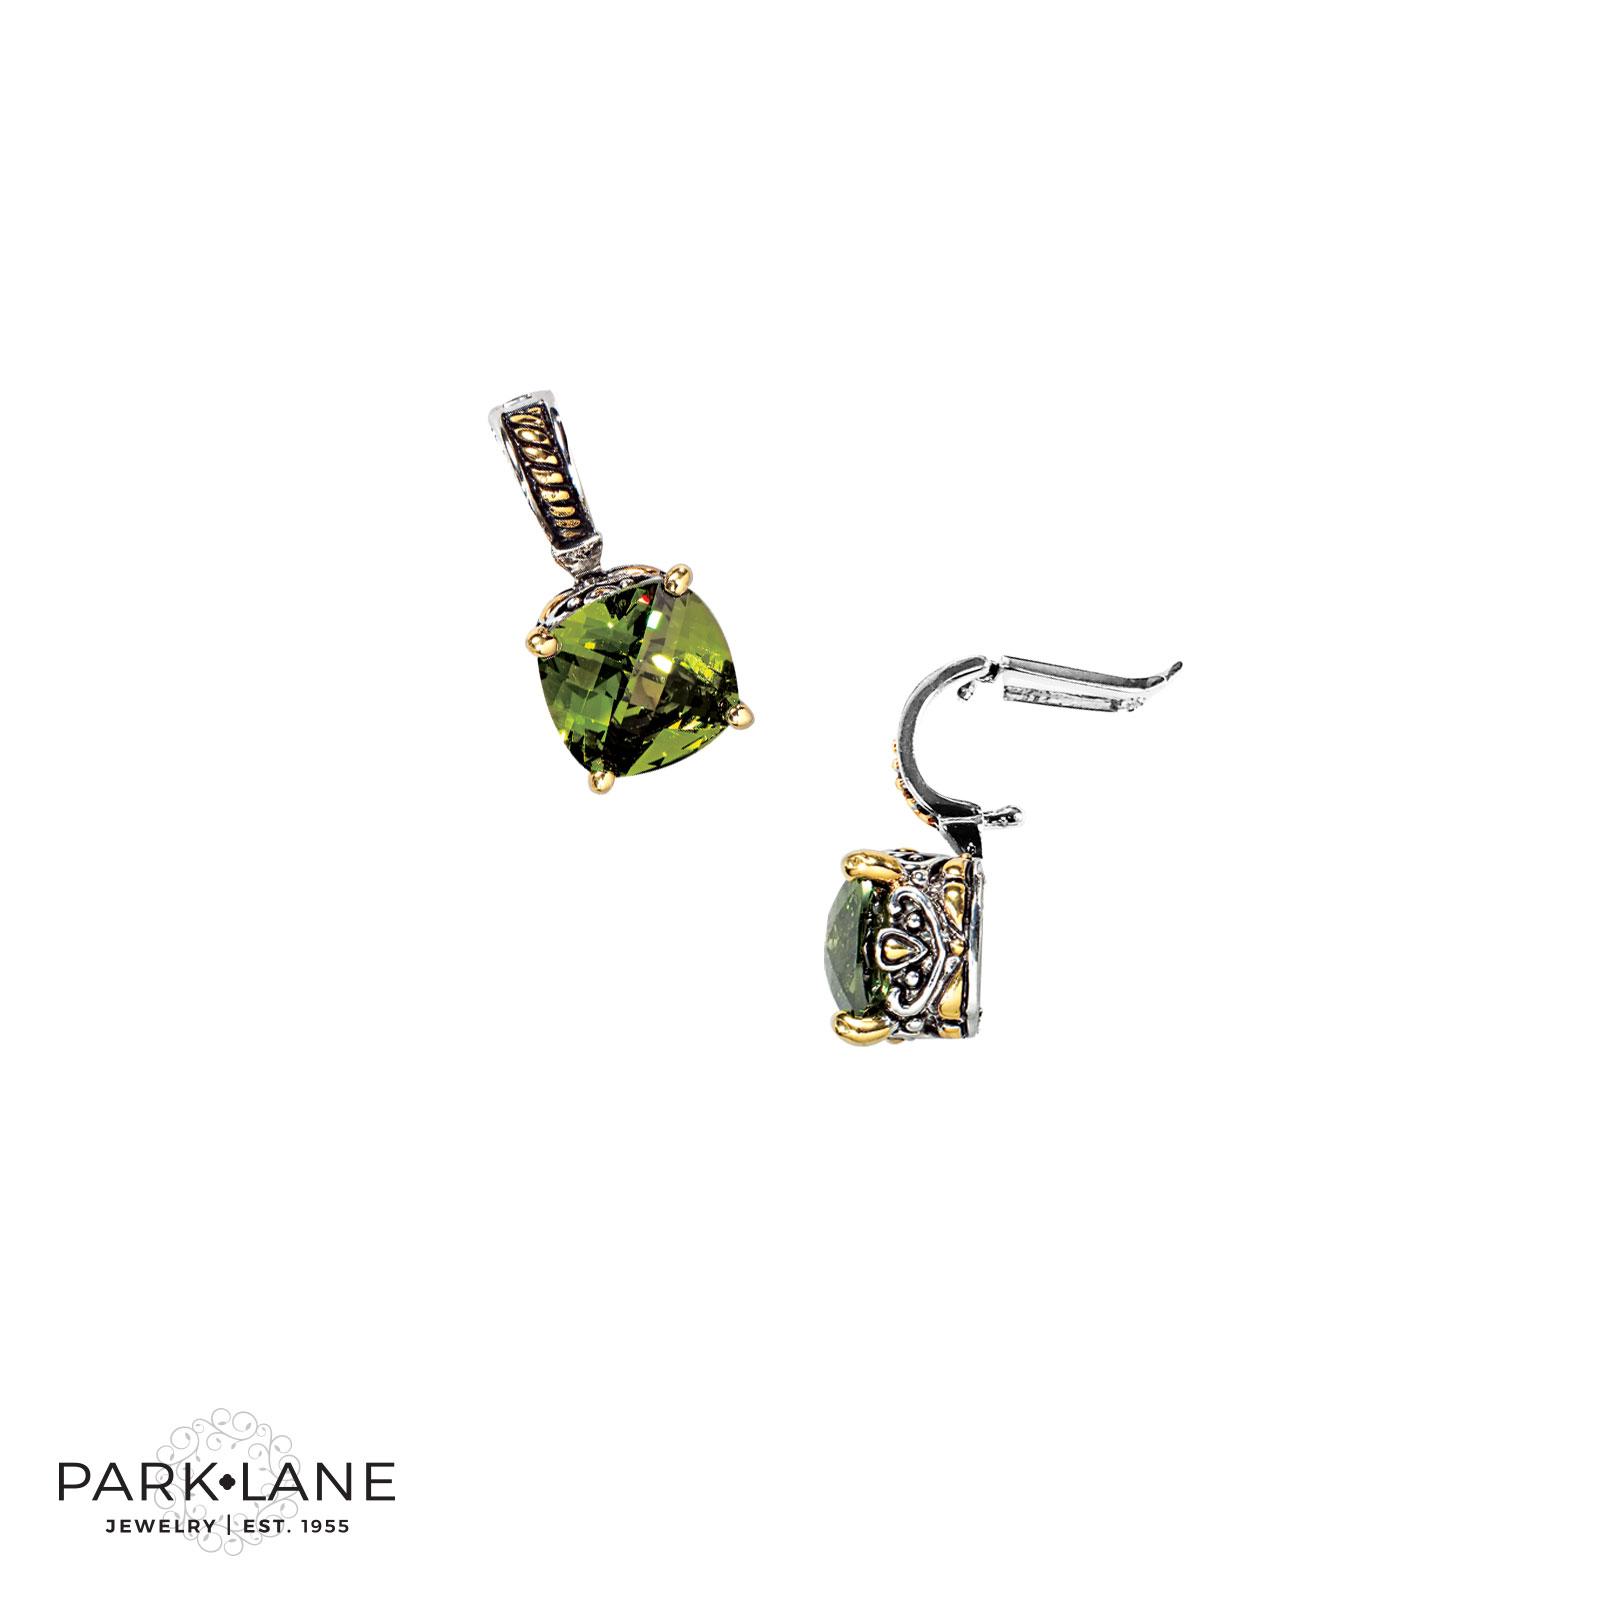 Park Lane Jewelry Signature Earring